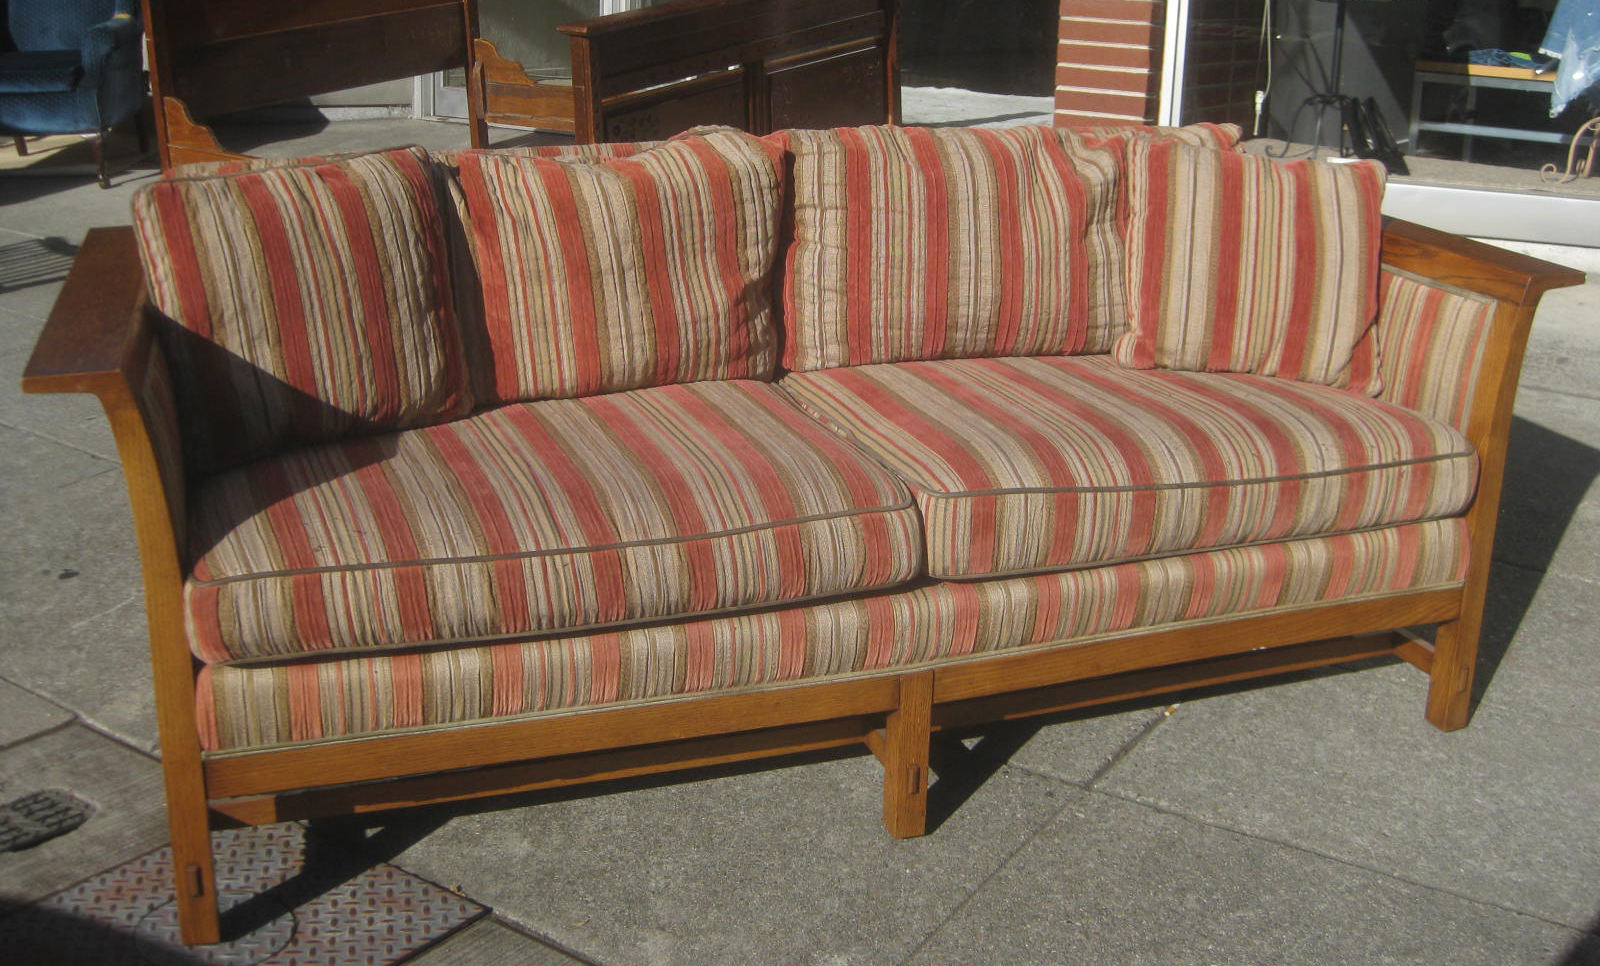 uhuru furniture collectibles sold arts crafts. Black Bedroom Furniture Sets. Home Design Ideas